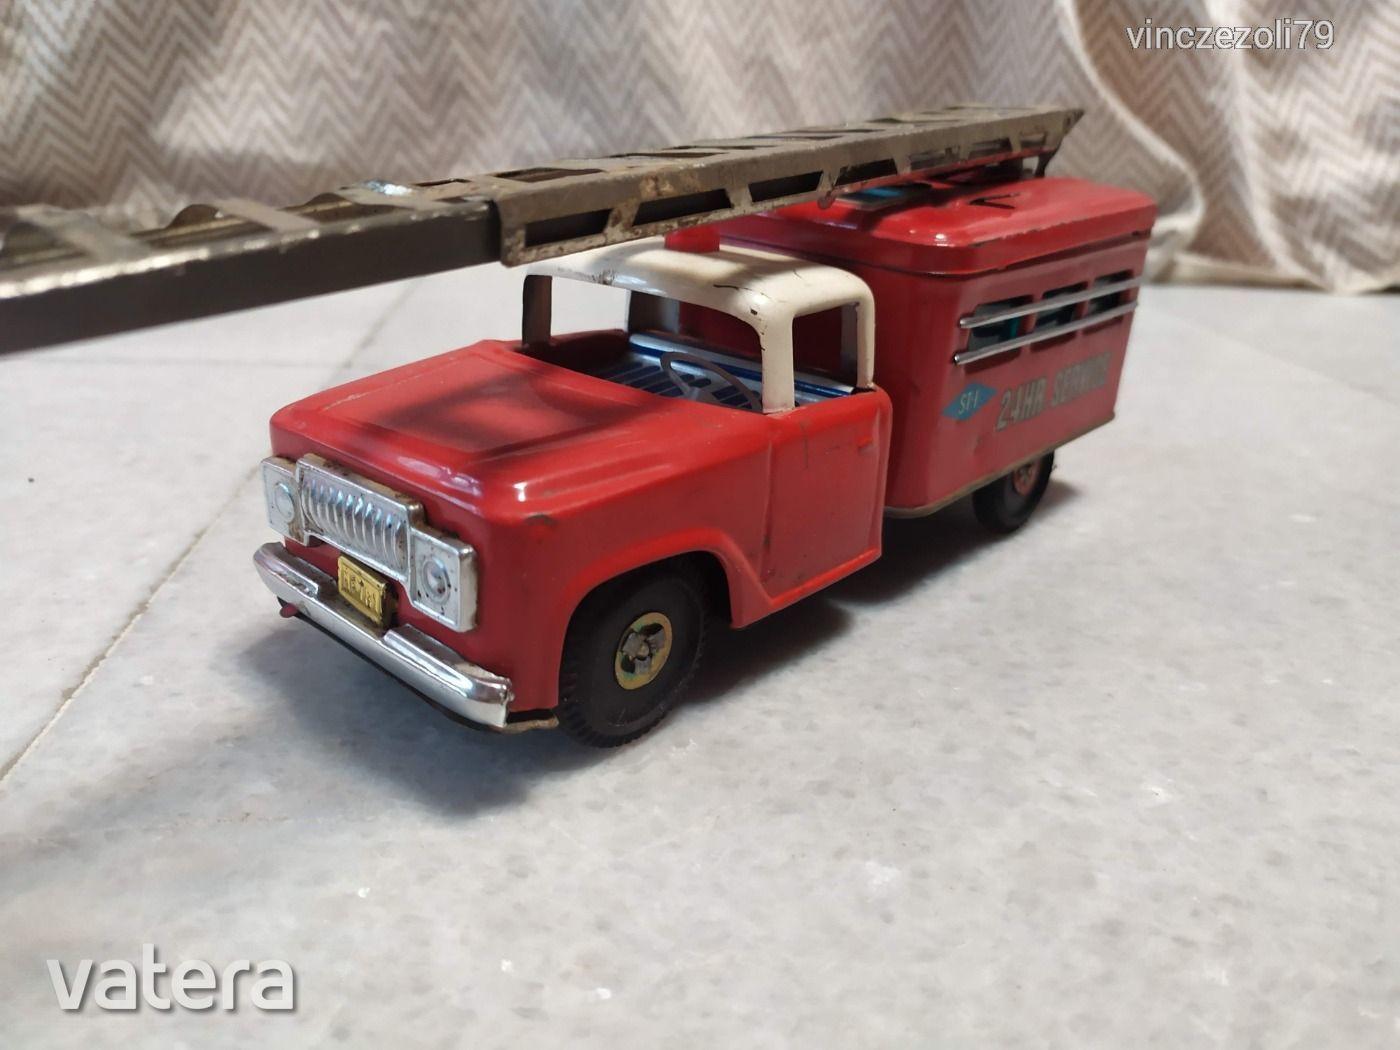 tuzoltoauto-retro-fem-kisauto-19fa_9_big.jpg